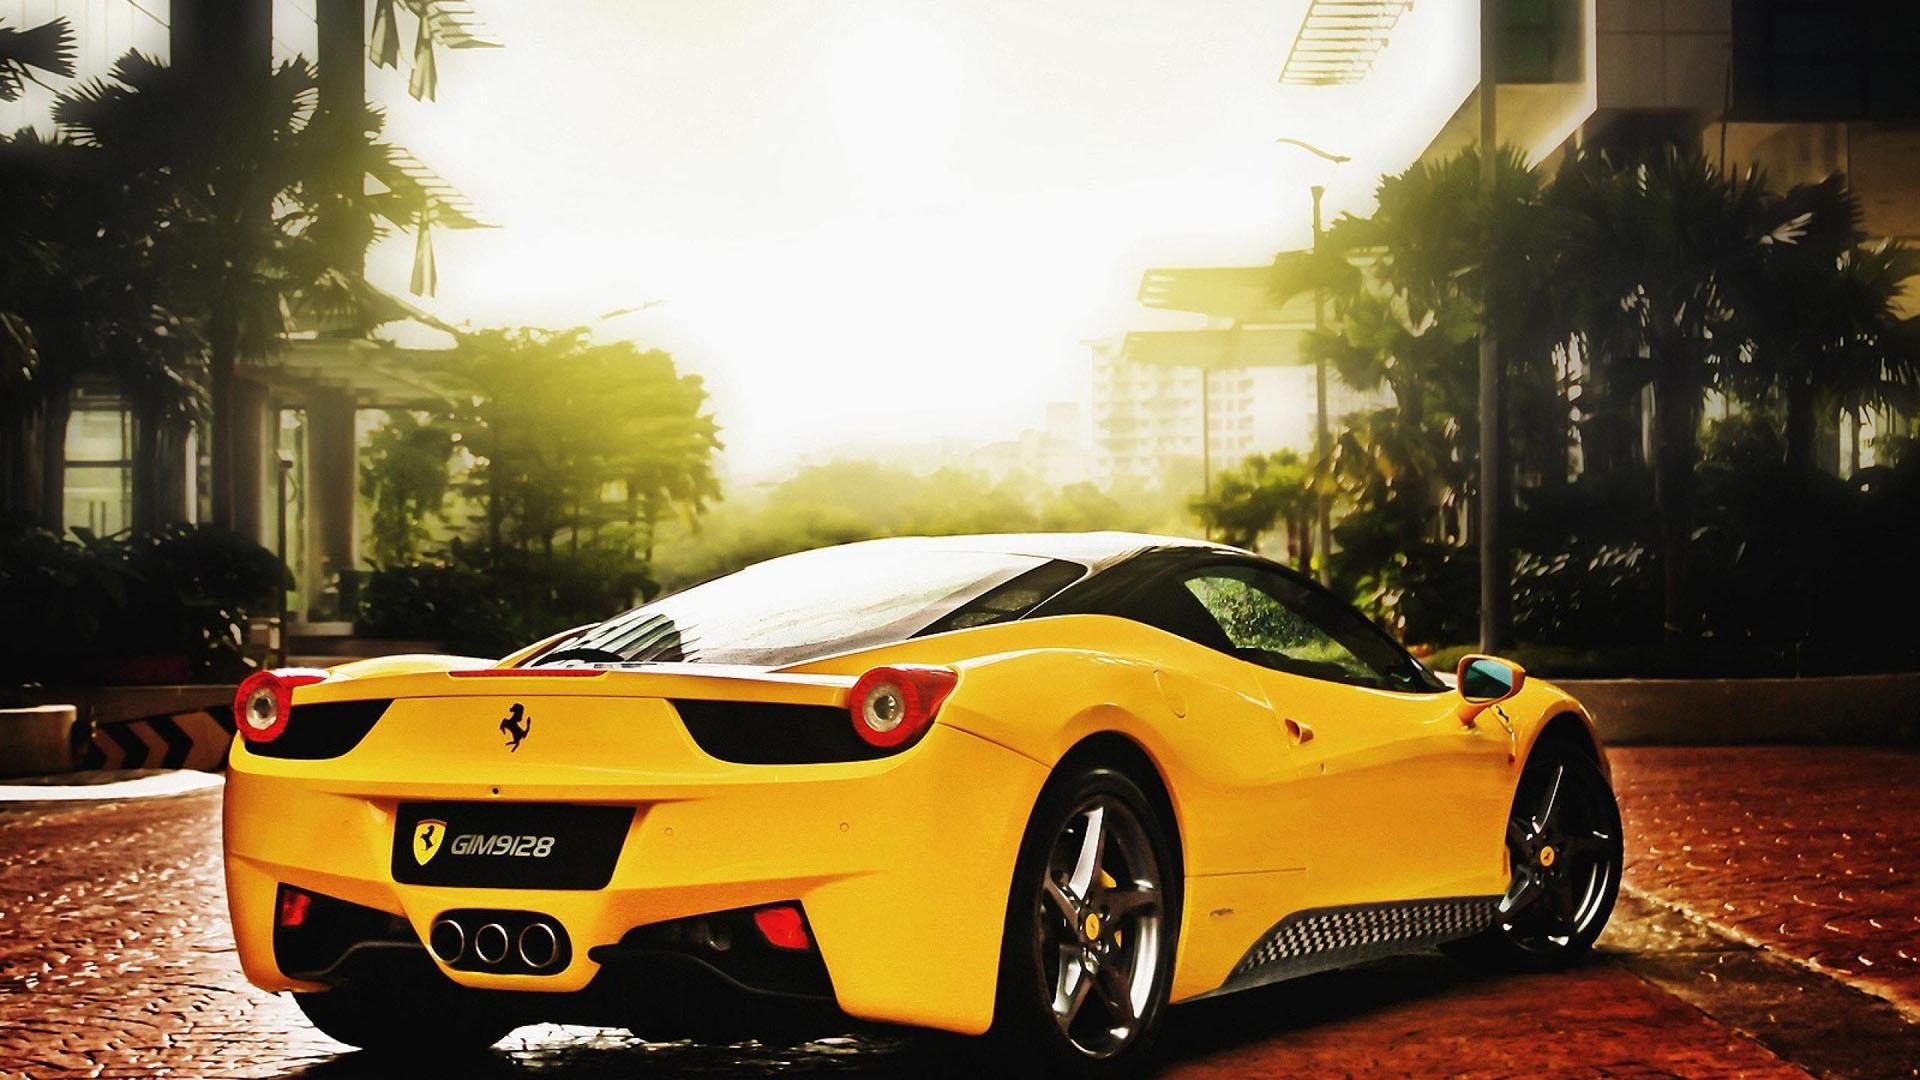 Awesome Ferrari Wallpaper